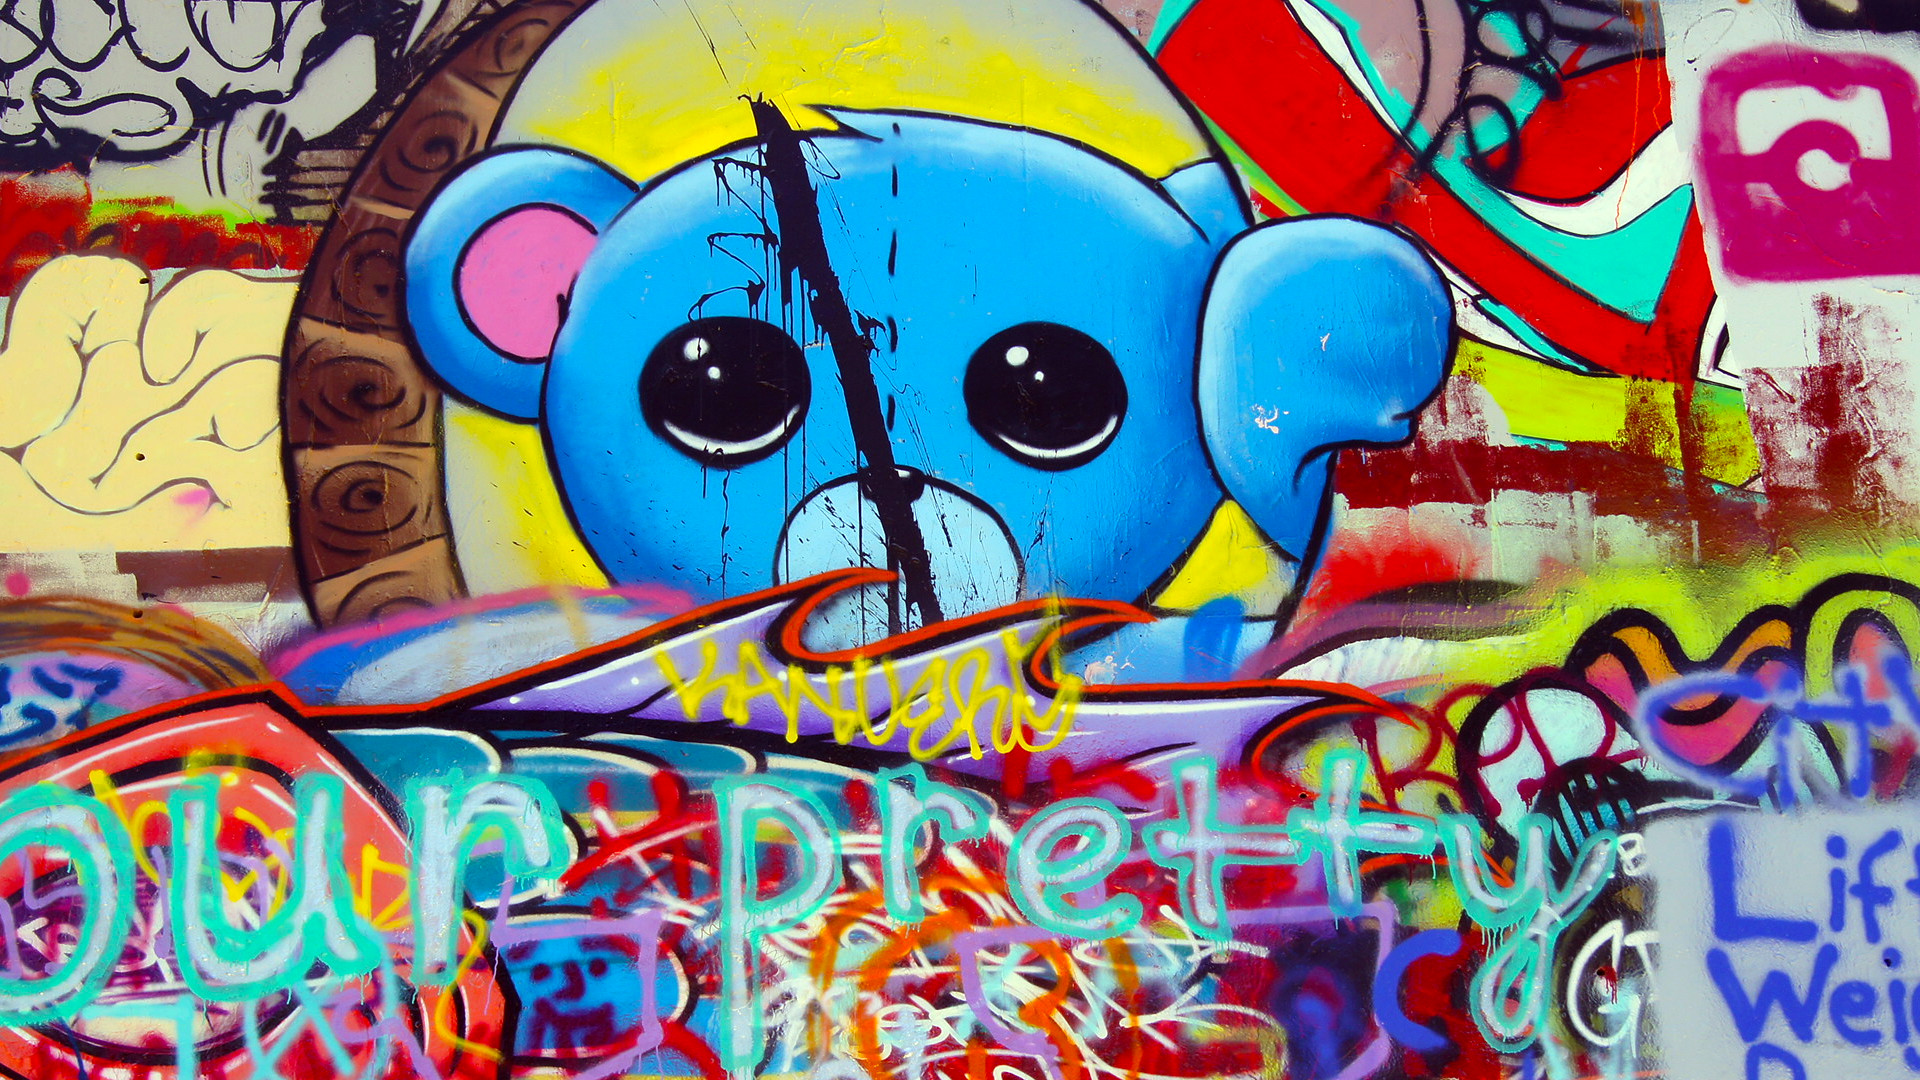 Graffiti Background (69+ Images